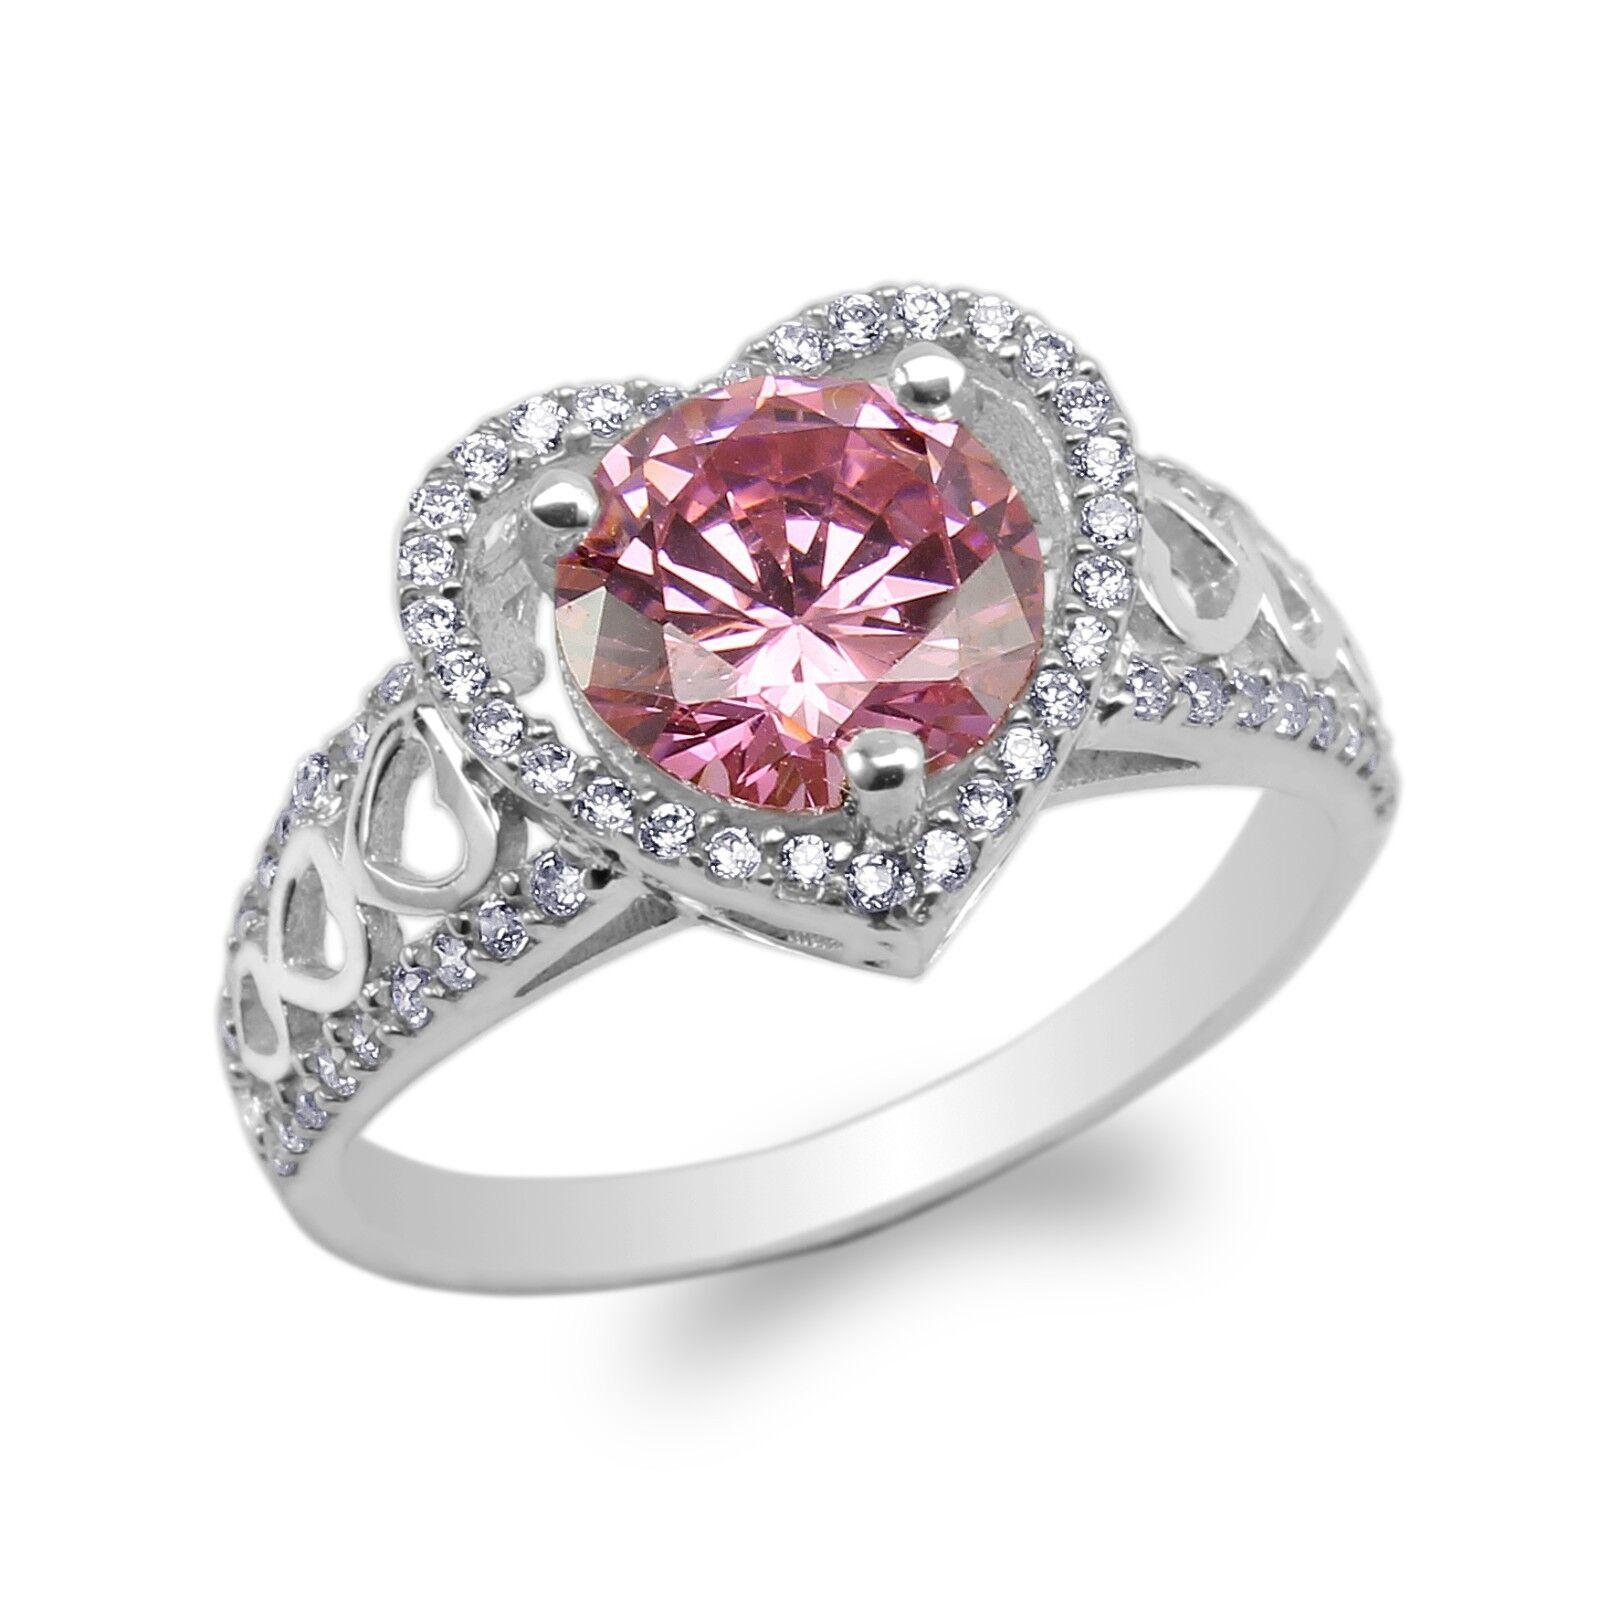 JamesJenny 10K 14K White gold Heart Shaped Halo Round CZ Ring Size 5-9